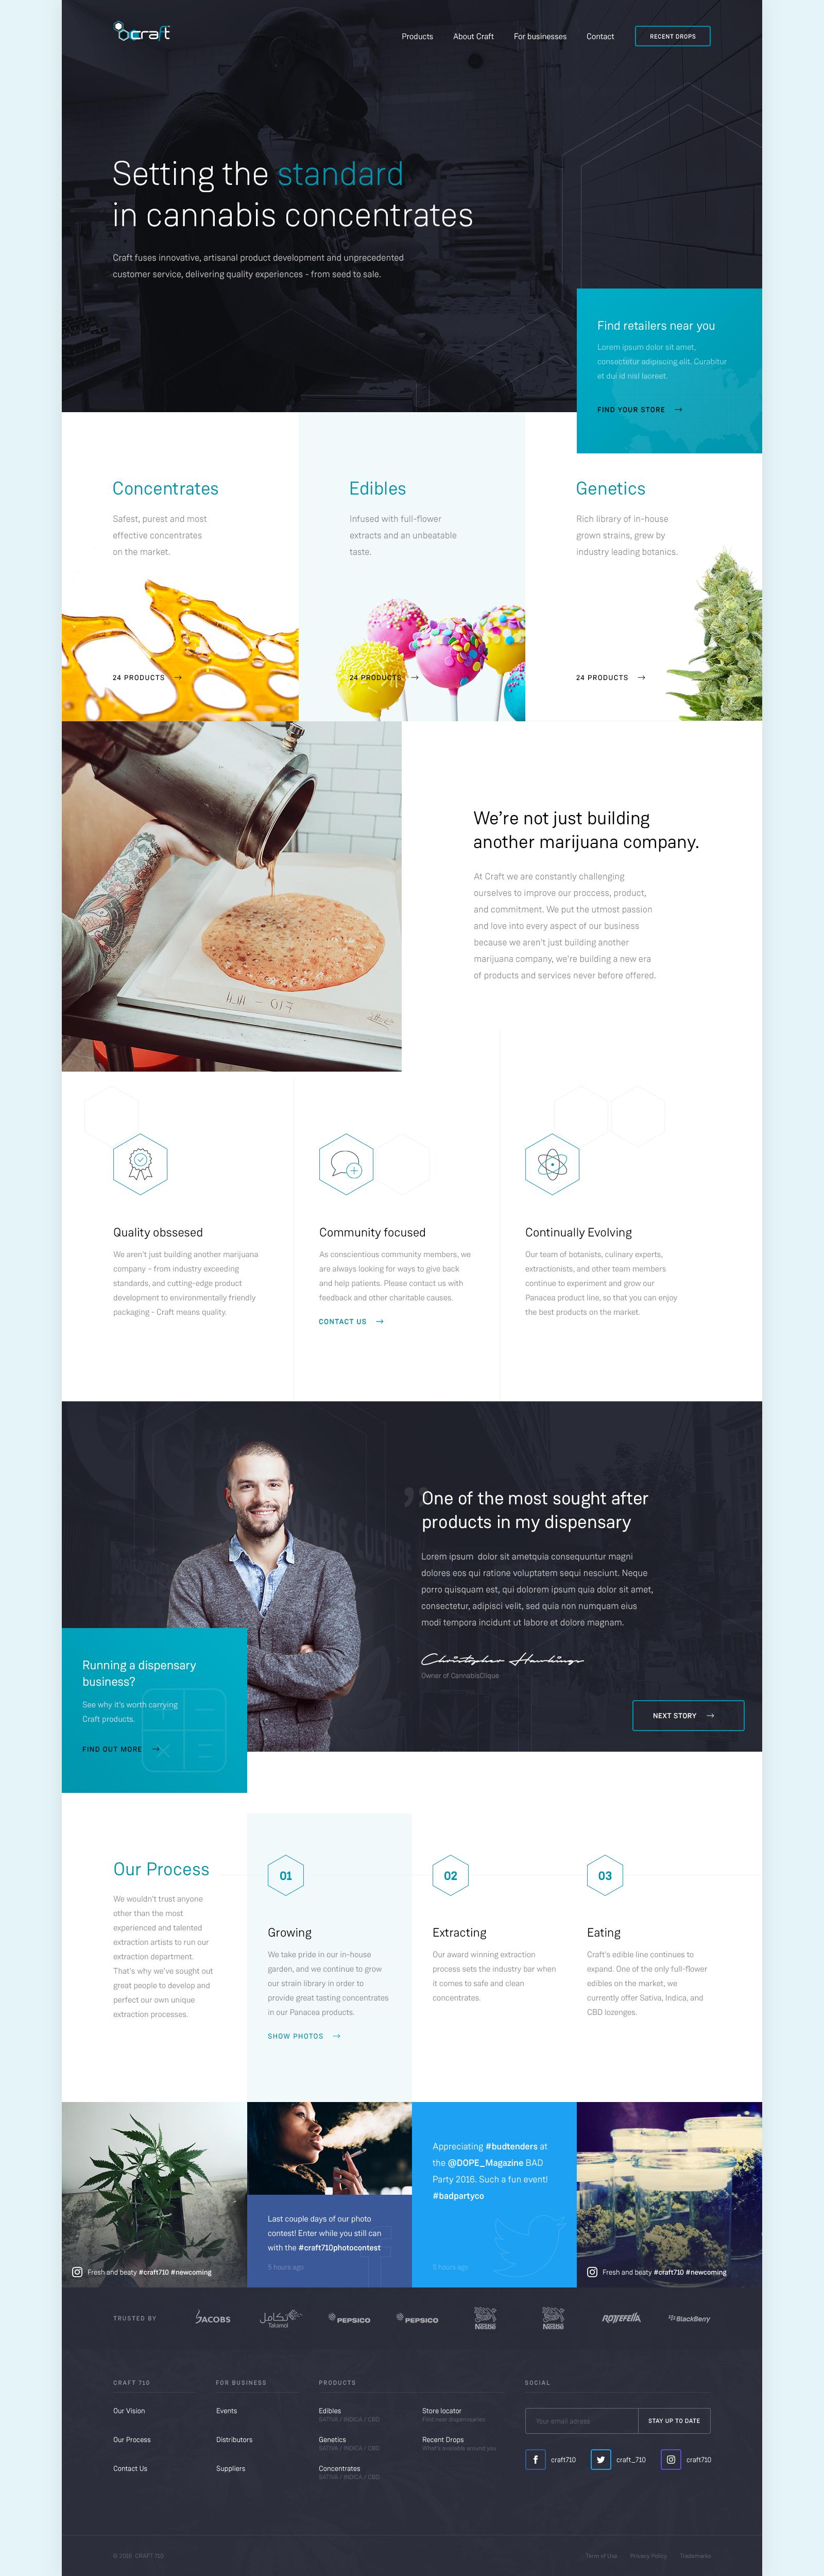 Craft home | User Interface Design Ideas | Pinterest | Crafts, Web ...